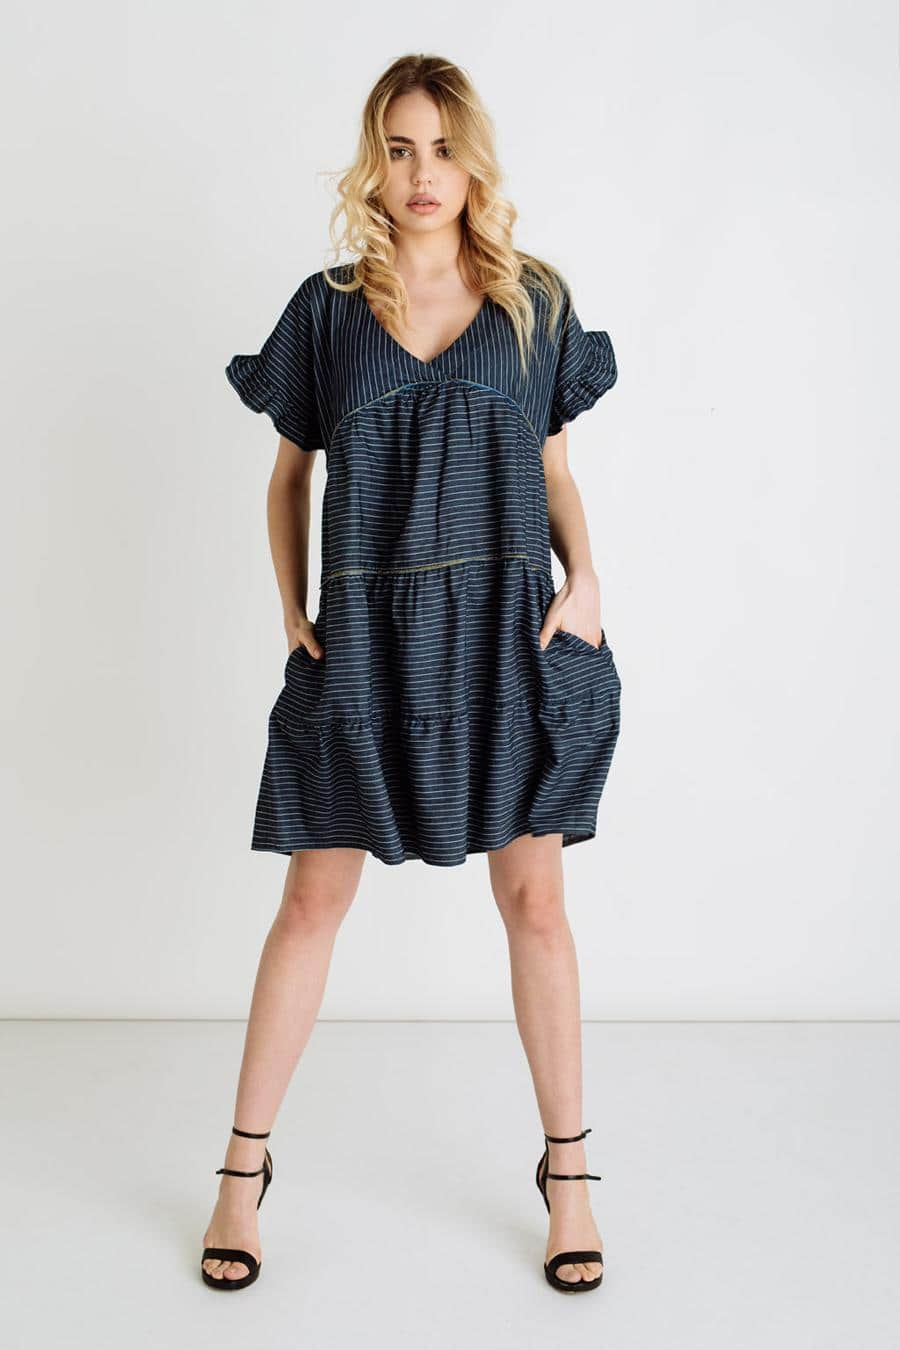 jagger zenska haljina kolekcija prolece leto 2021 ss 2021 kupi online jg 5501 03 1